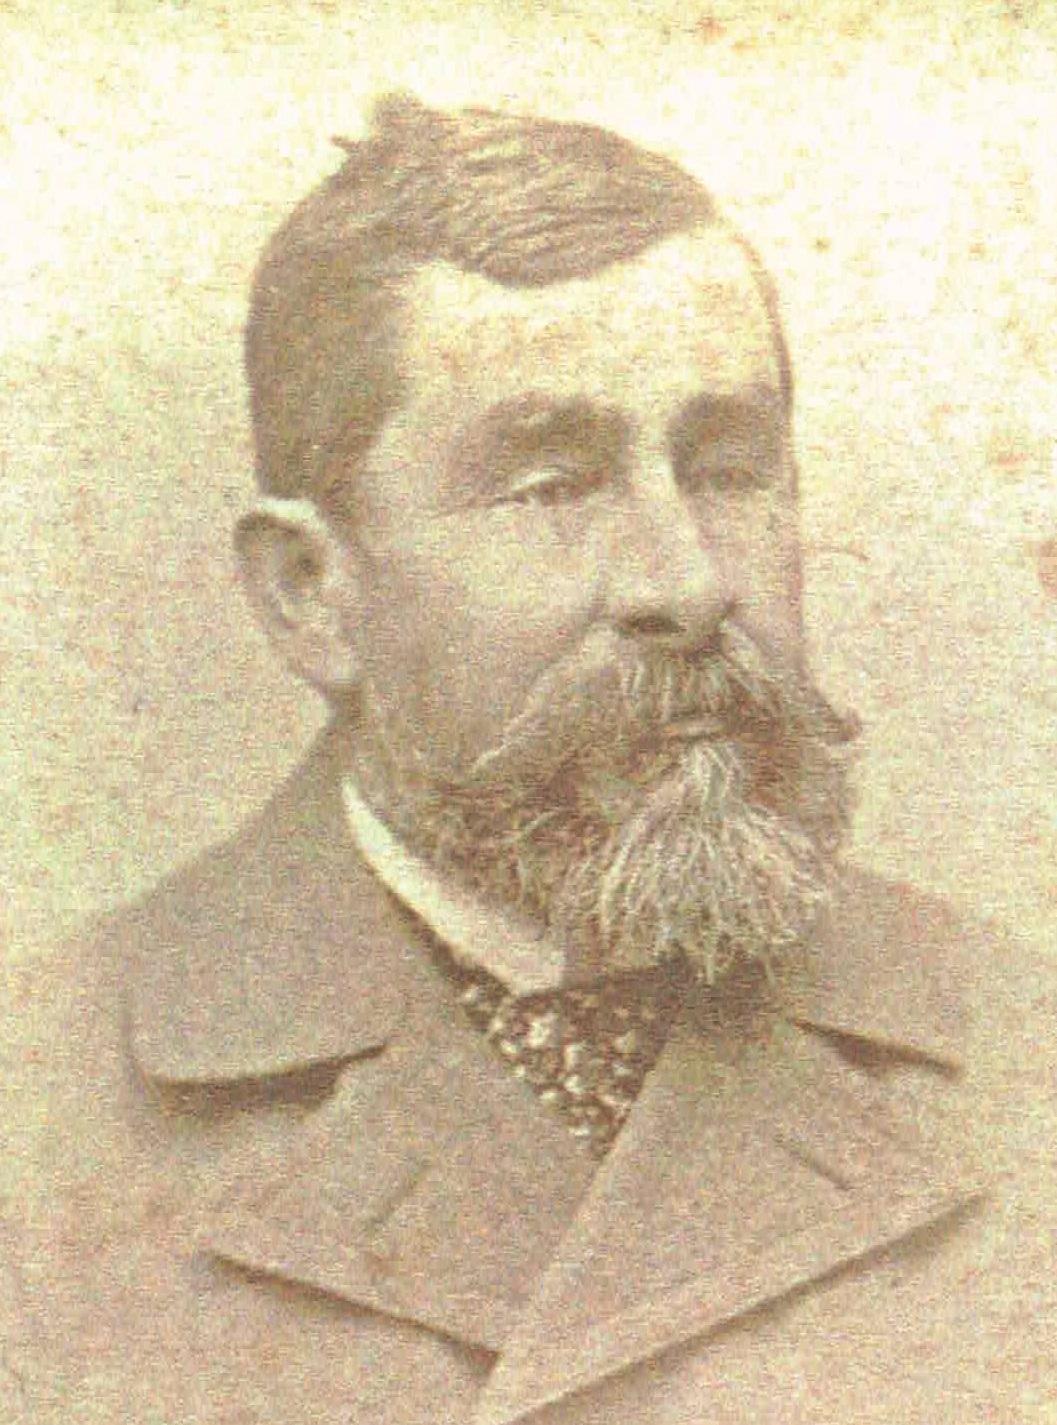 Franciszek Gardulinski